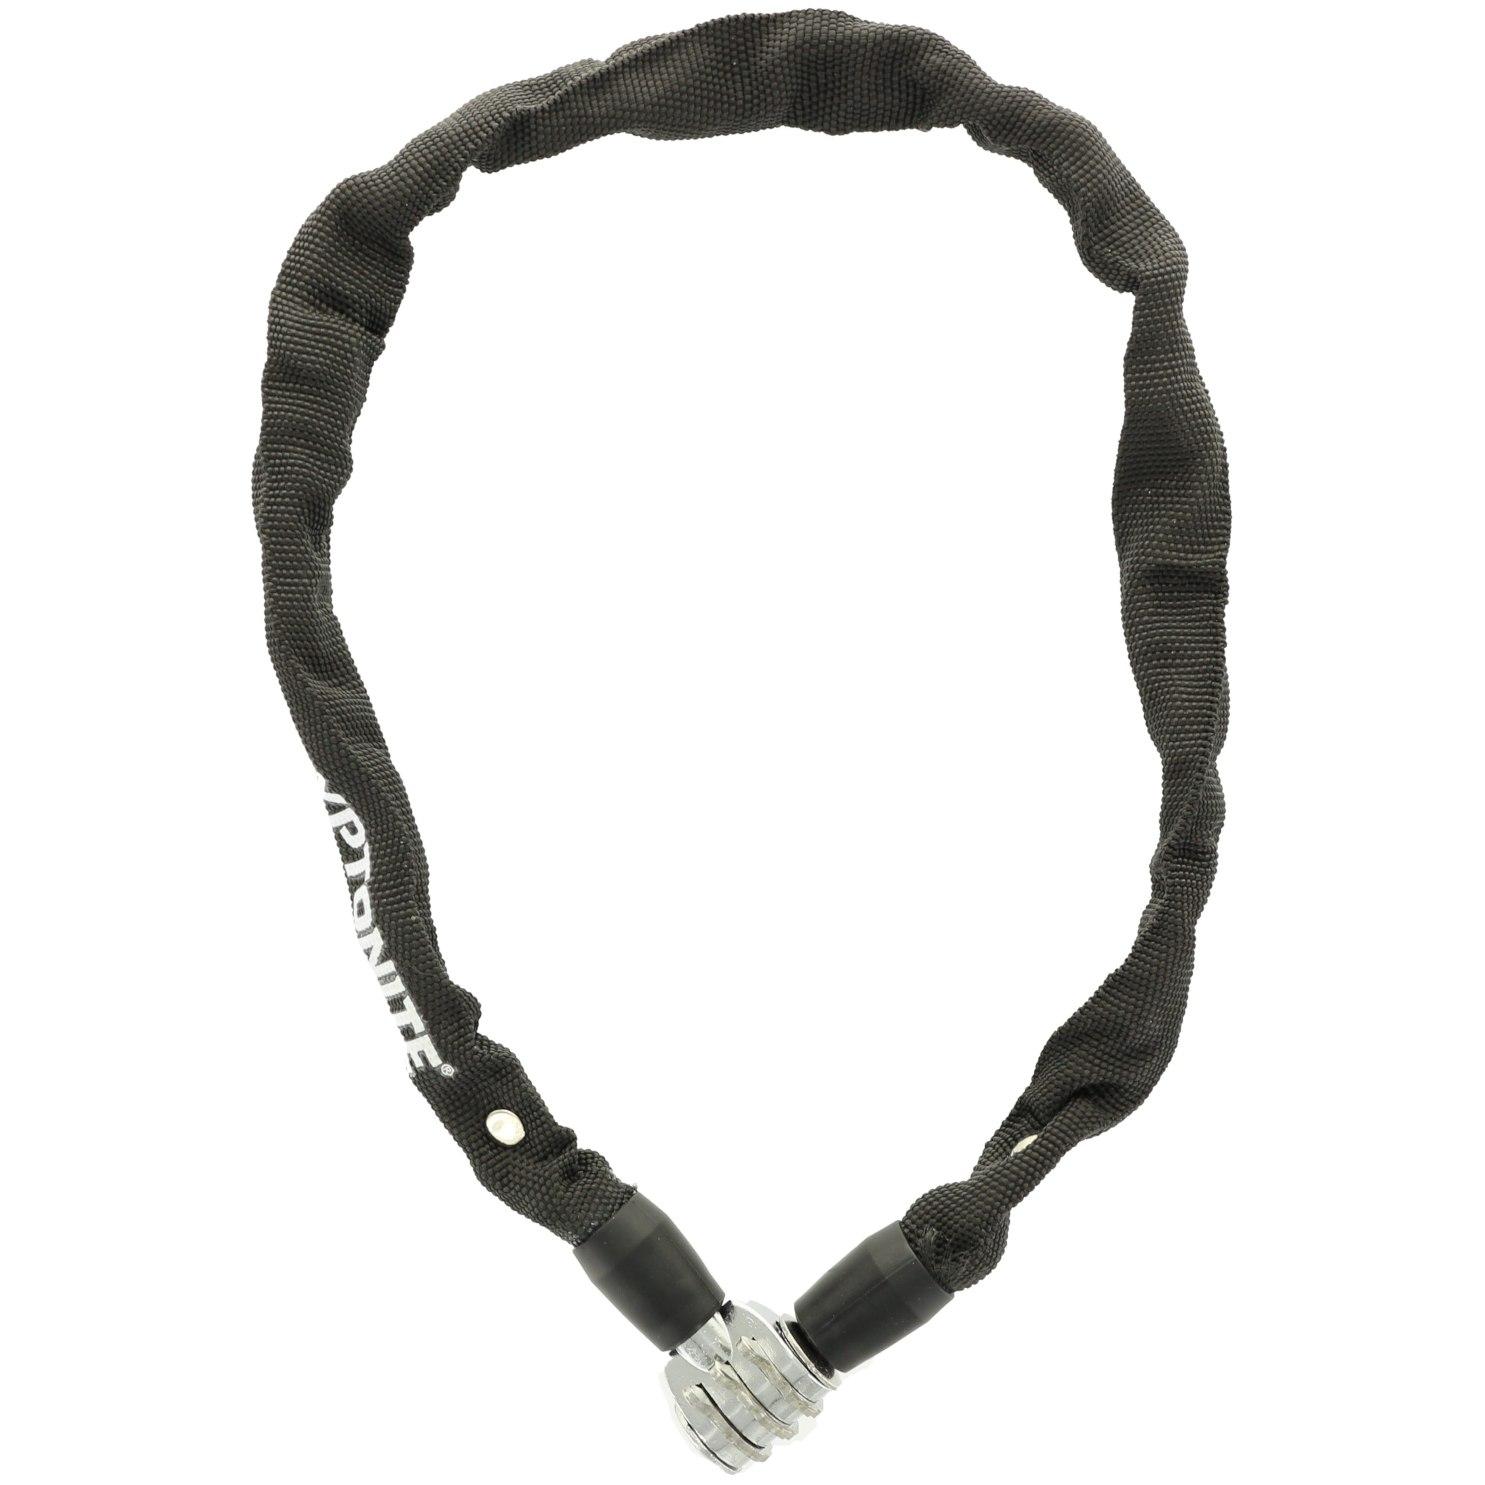 Kryptonite Keeper 465 Combo Chain Lock - black